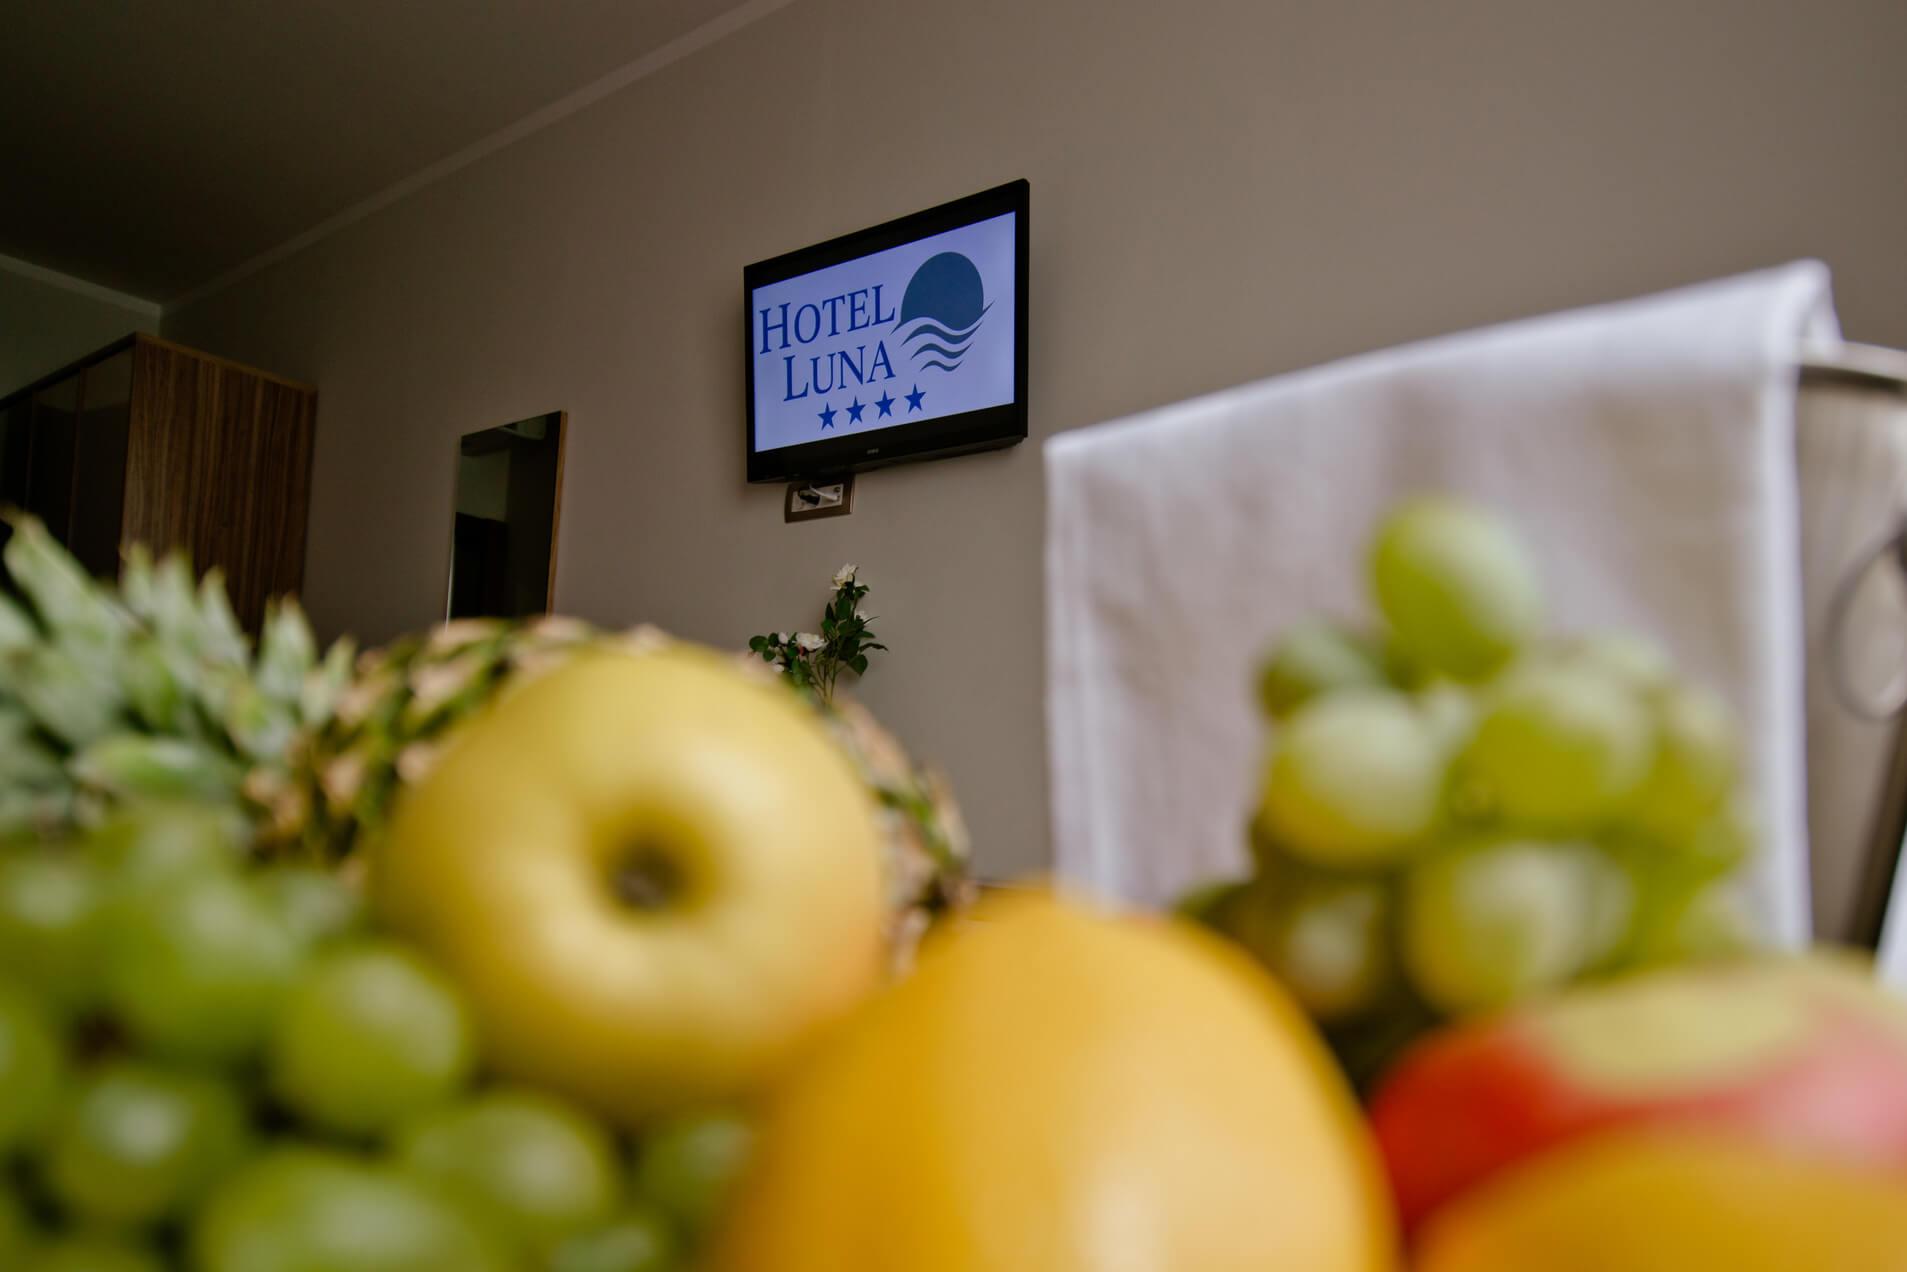 Specijalne usluge u sobi/Special room service/Servizio in camera speciale